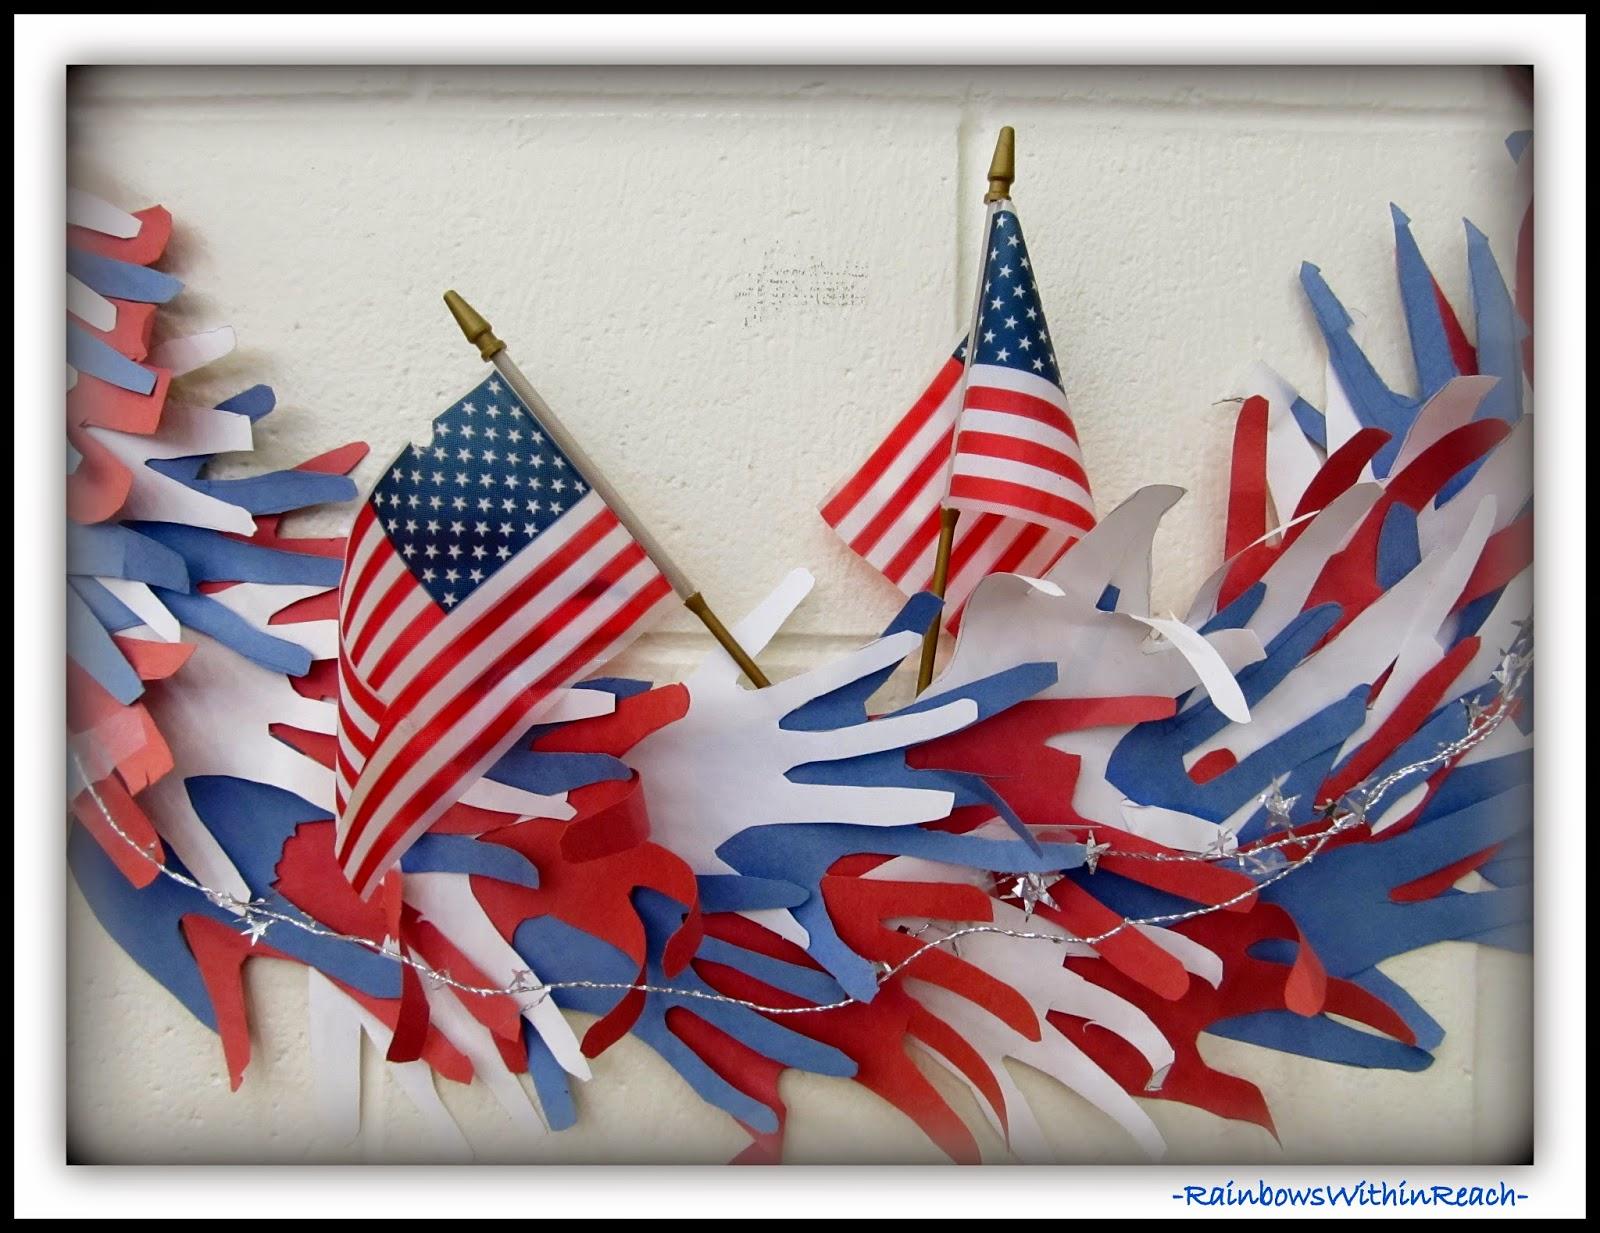 Traced Hands Create a Patriotic Wreath via RainbowsWithinReach